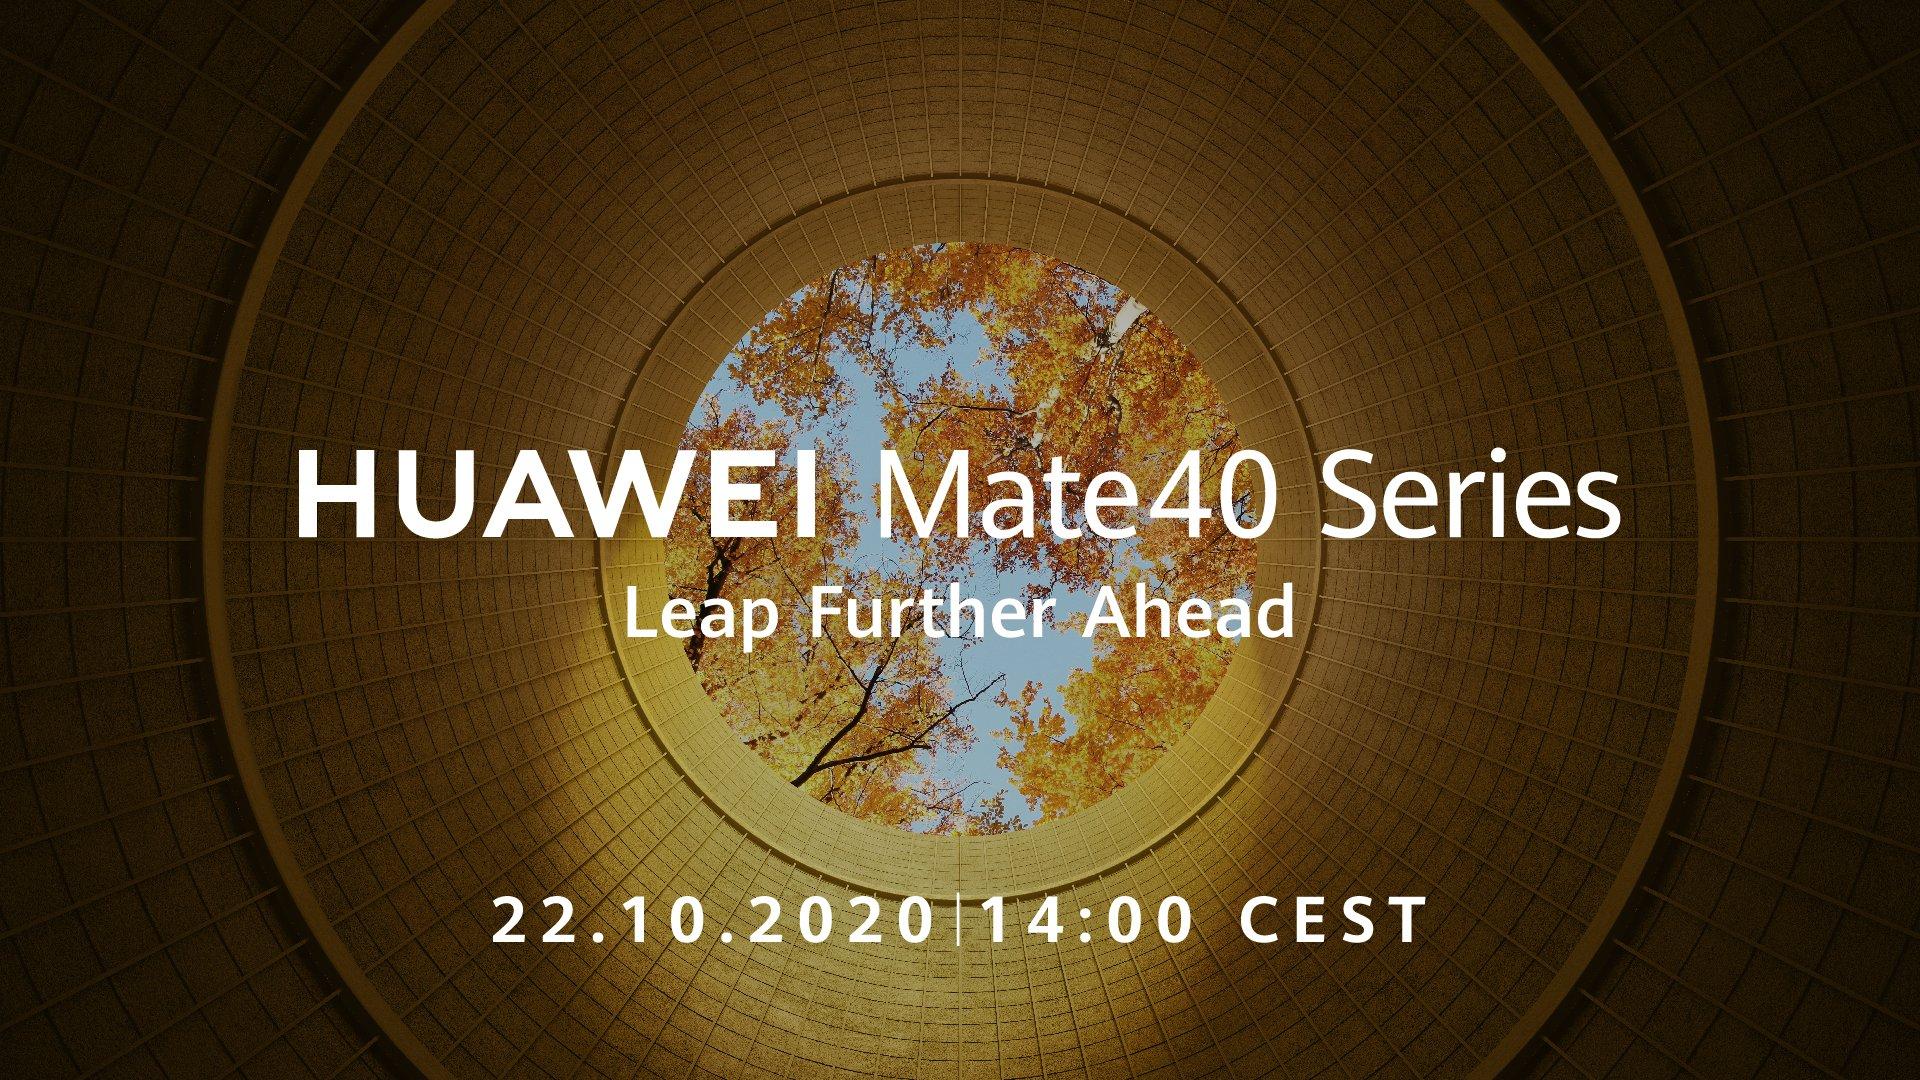 Huawei Mate 40 Pro+ sarà il primo smartphone di Huawei con così tanta RAM